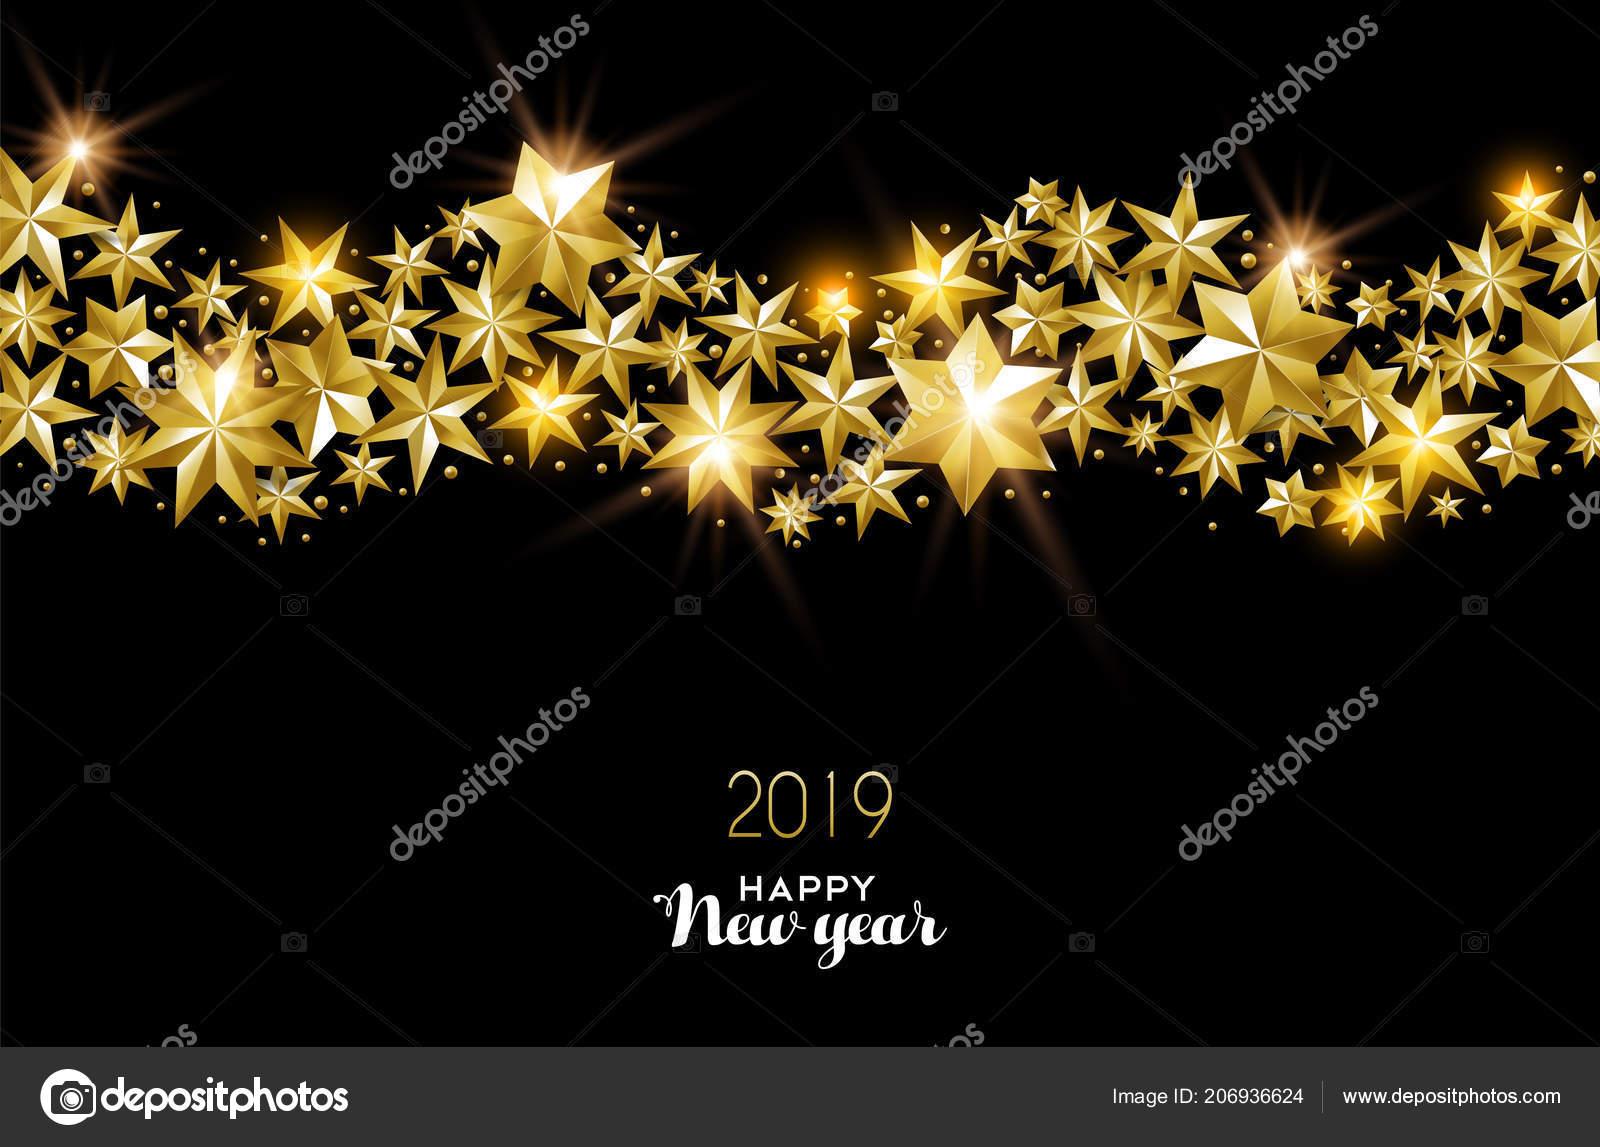 Happy New Year Elegant Images 41